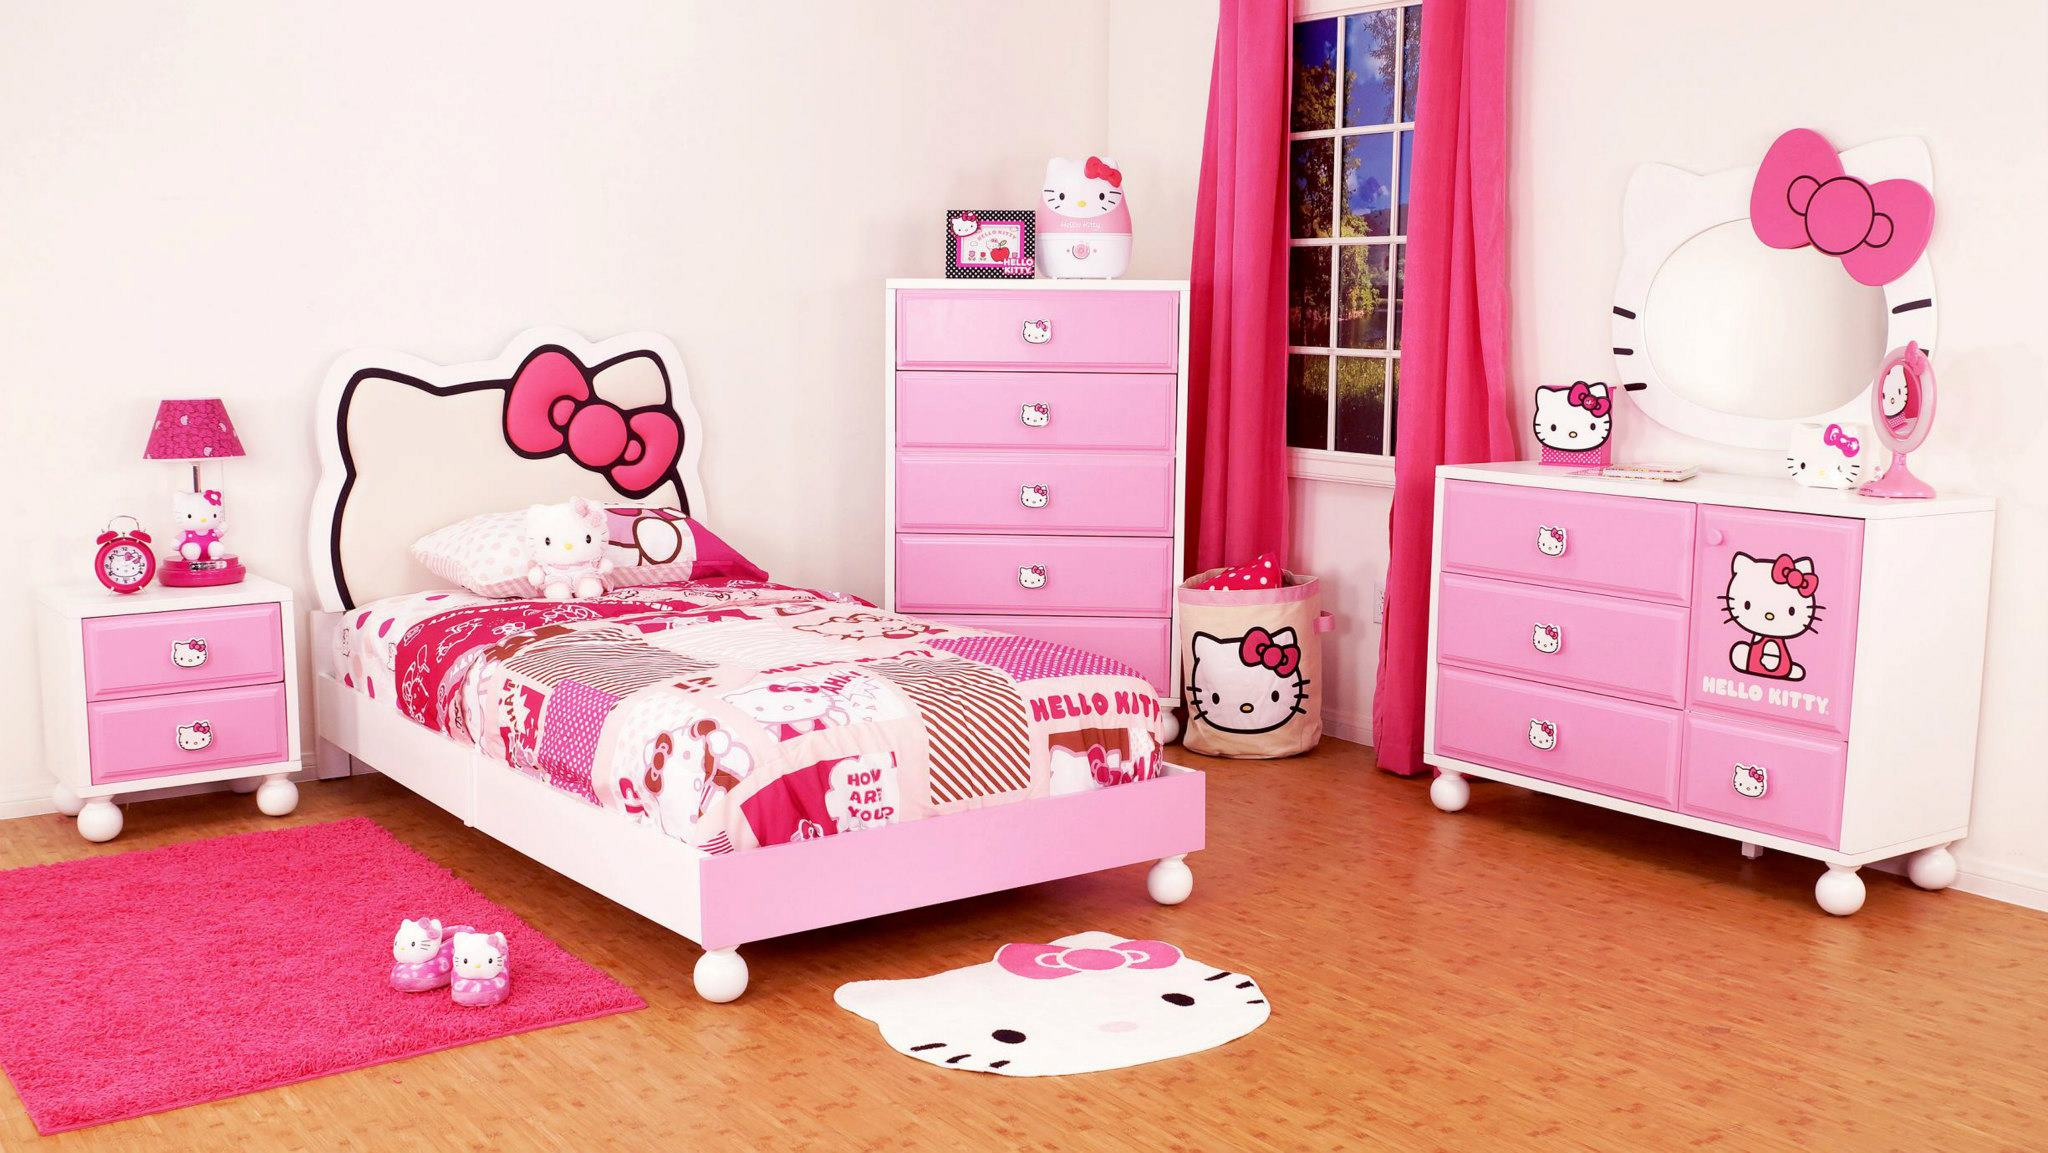 Menentukan ukuran motif wallpaper - Buat Kejutan Manis untuk Si Kecil dengan Memasang Wallpaper Dinding Hello Kitty - lovekidszone.com